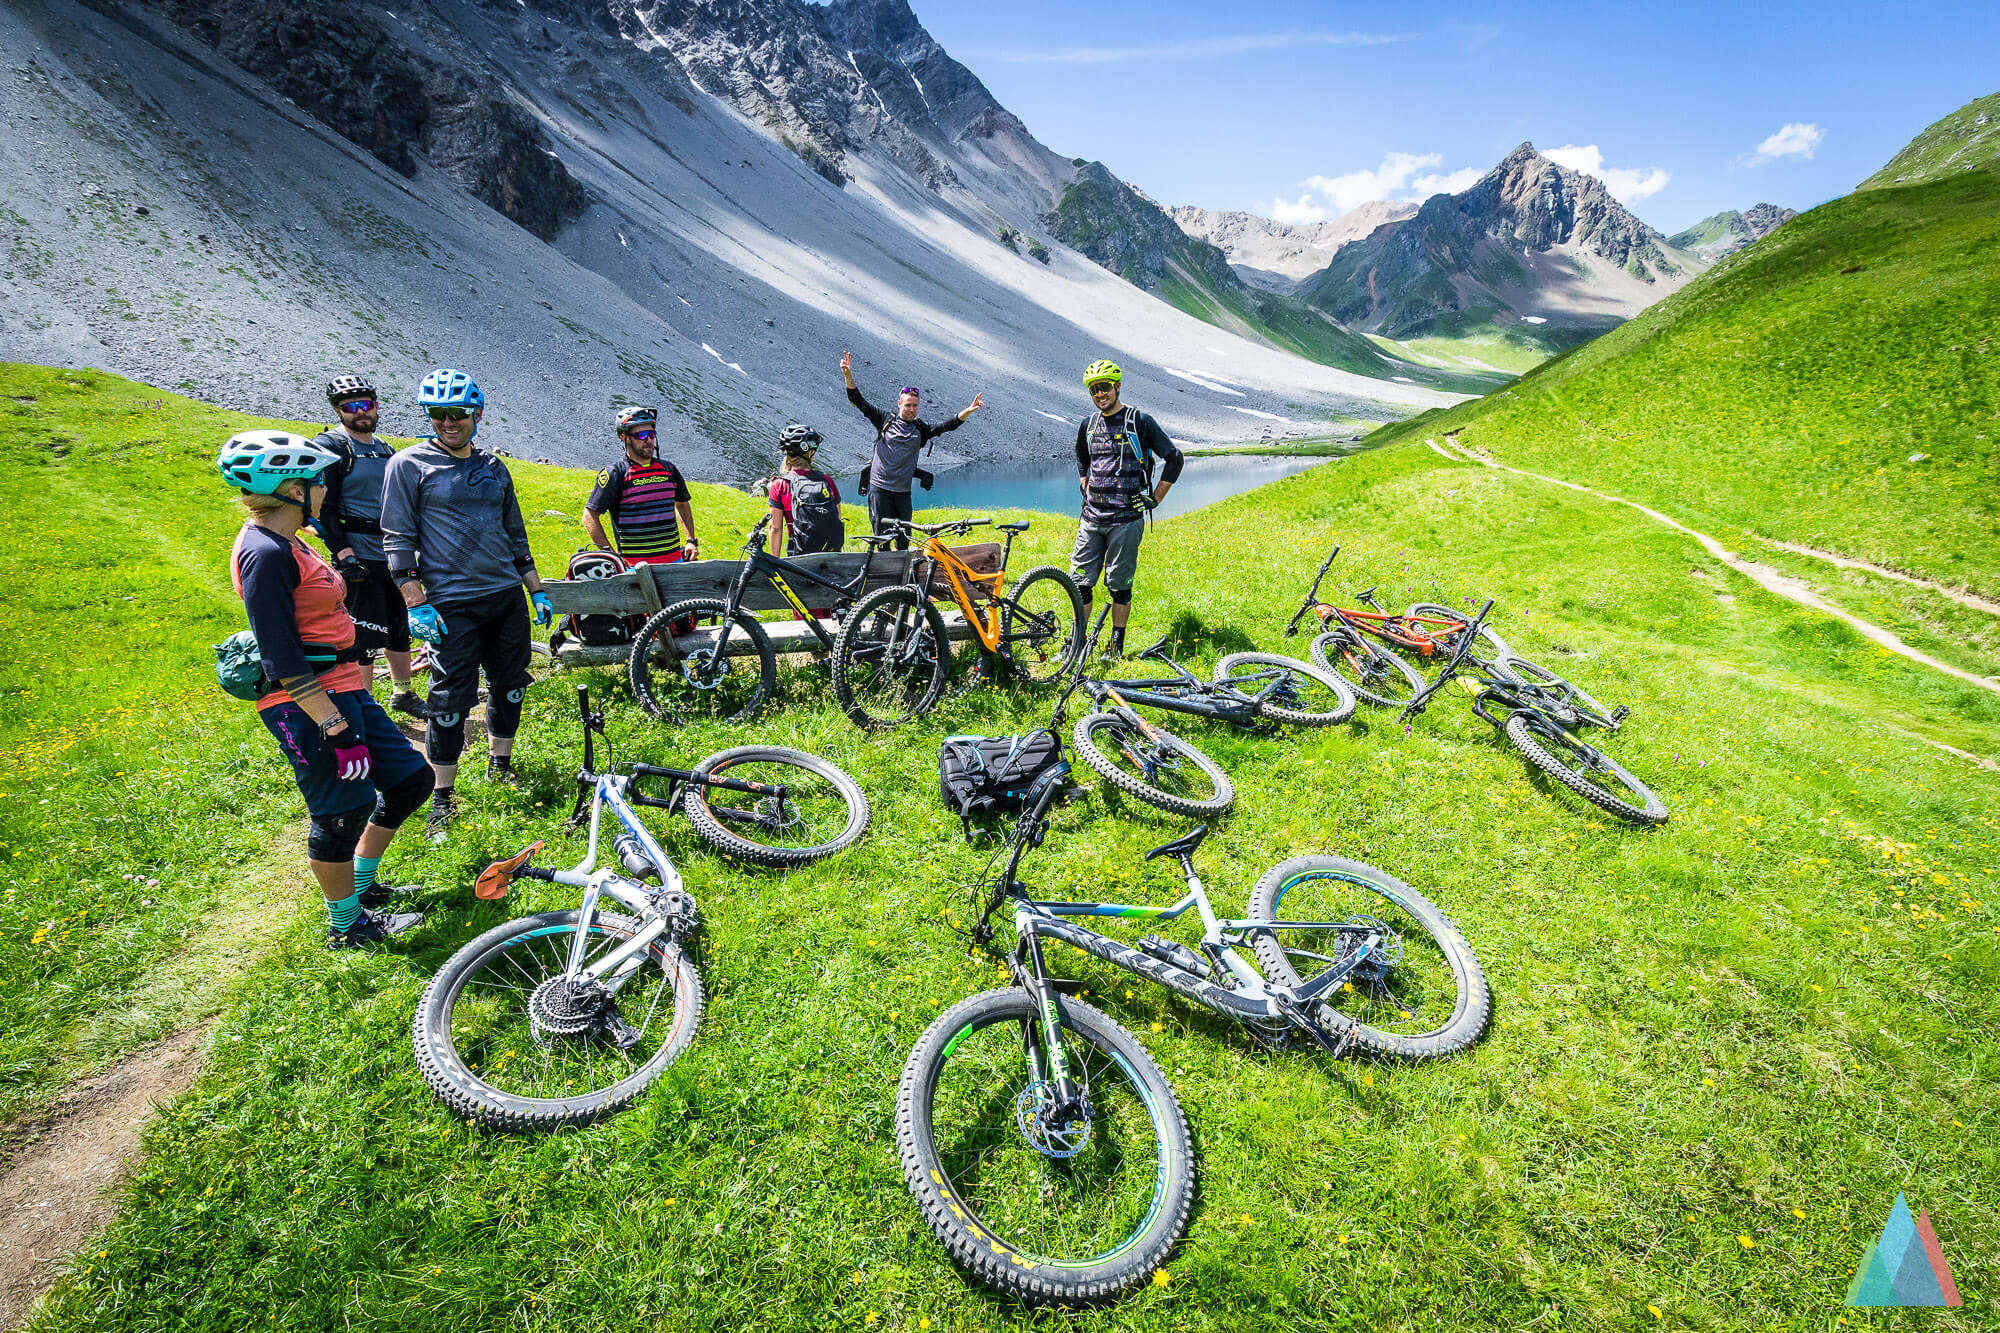 mtb-bahnentour-arosa-lenzerheide-älplisee-bike-gruppe